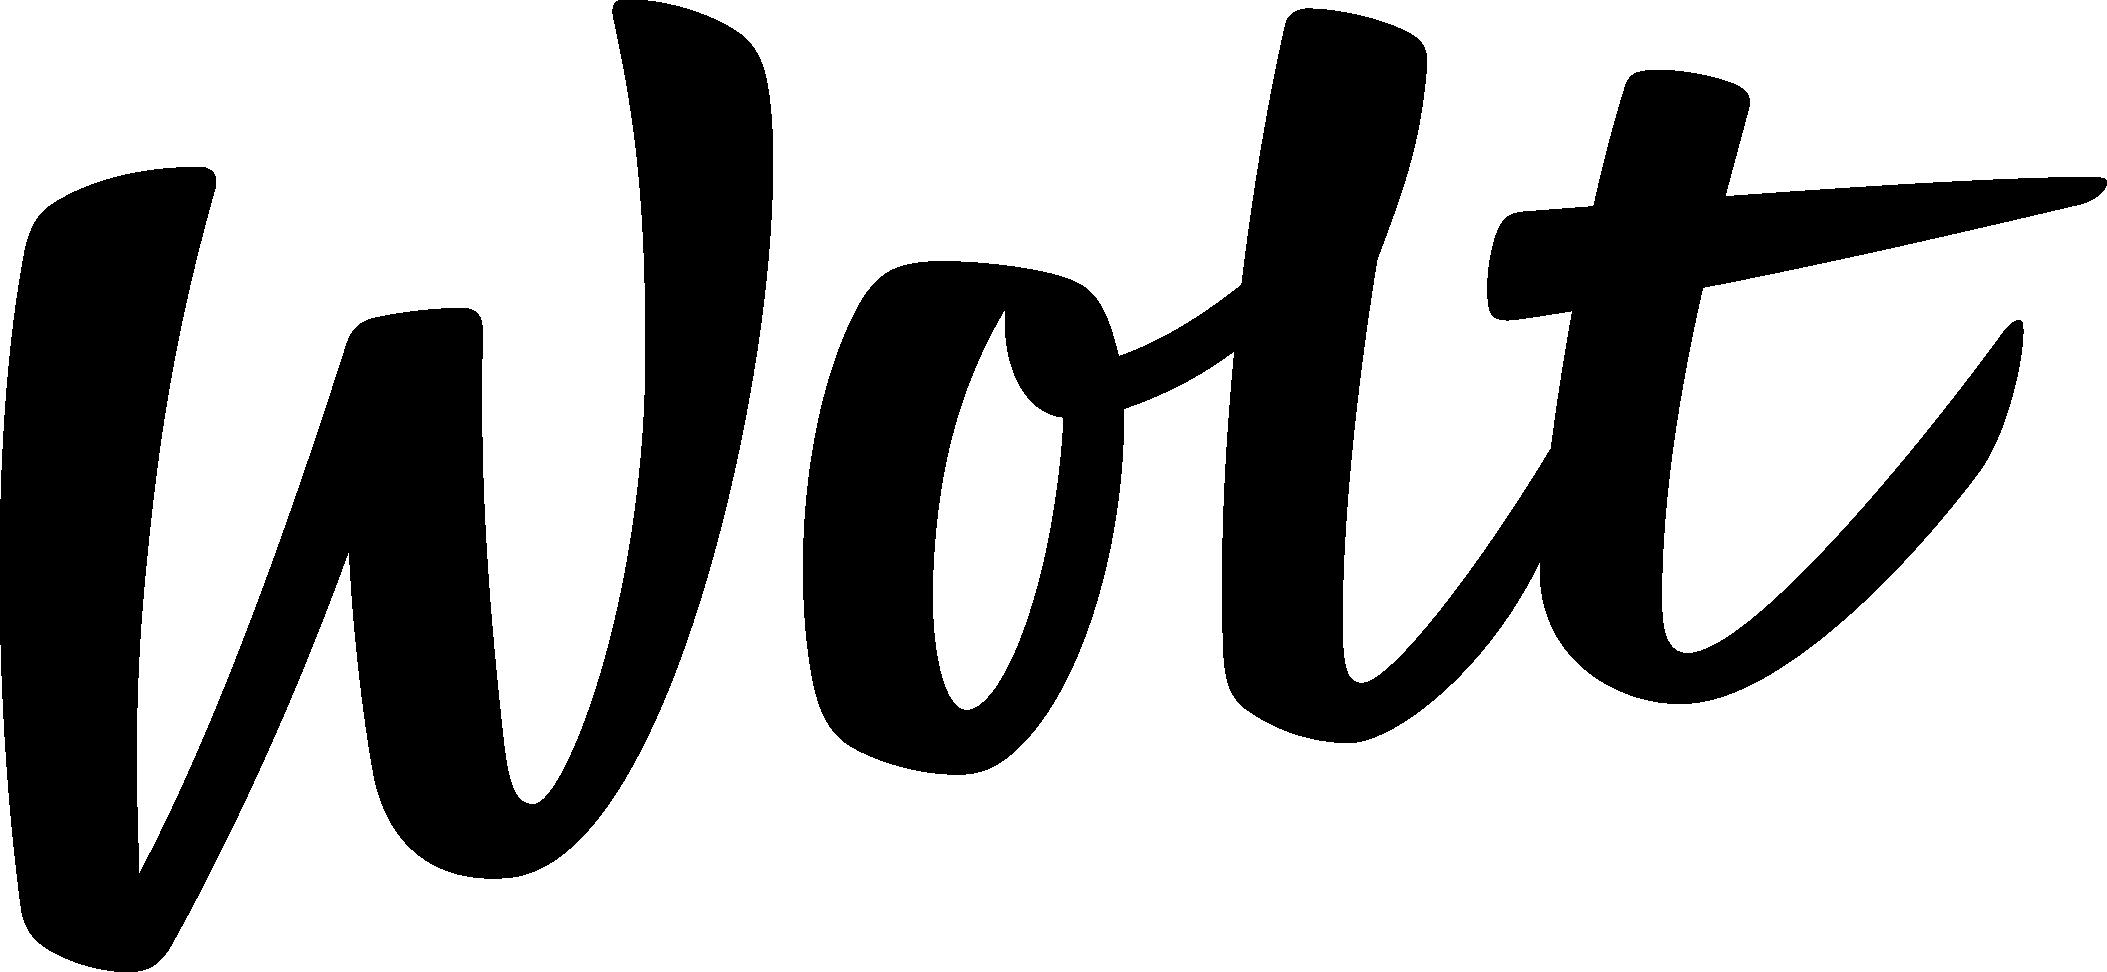 Link to external partner website wolt.com